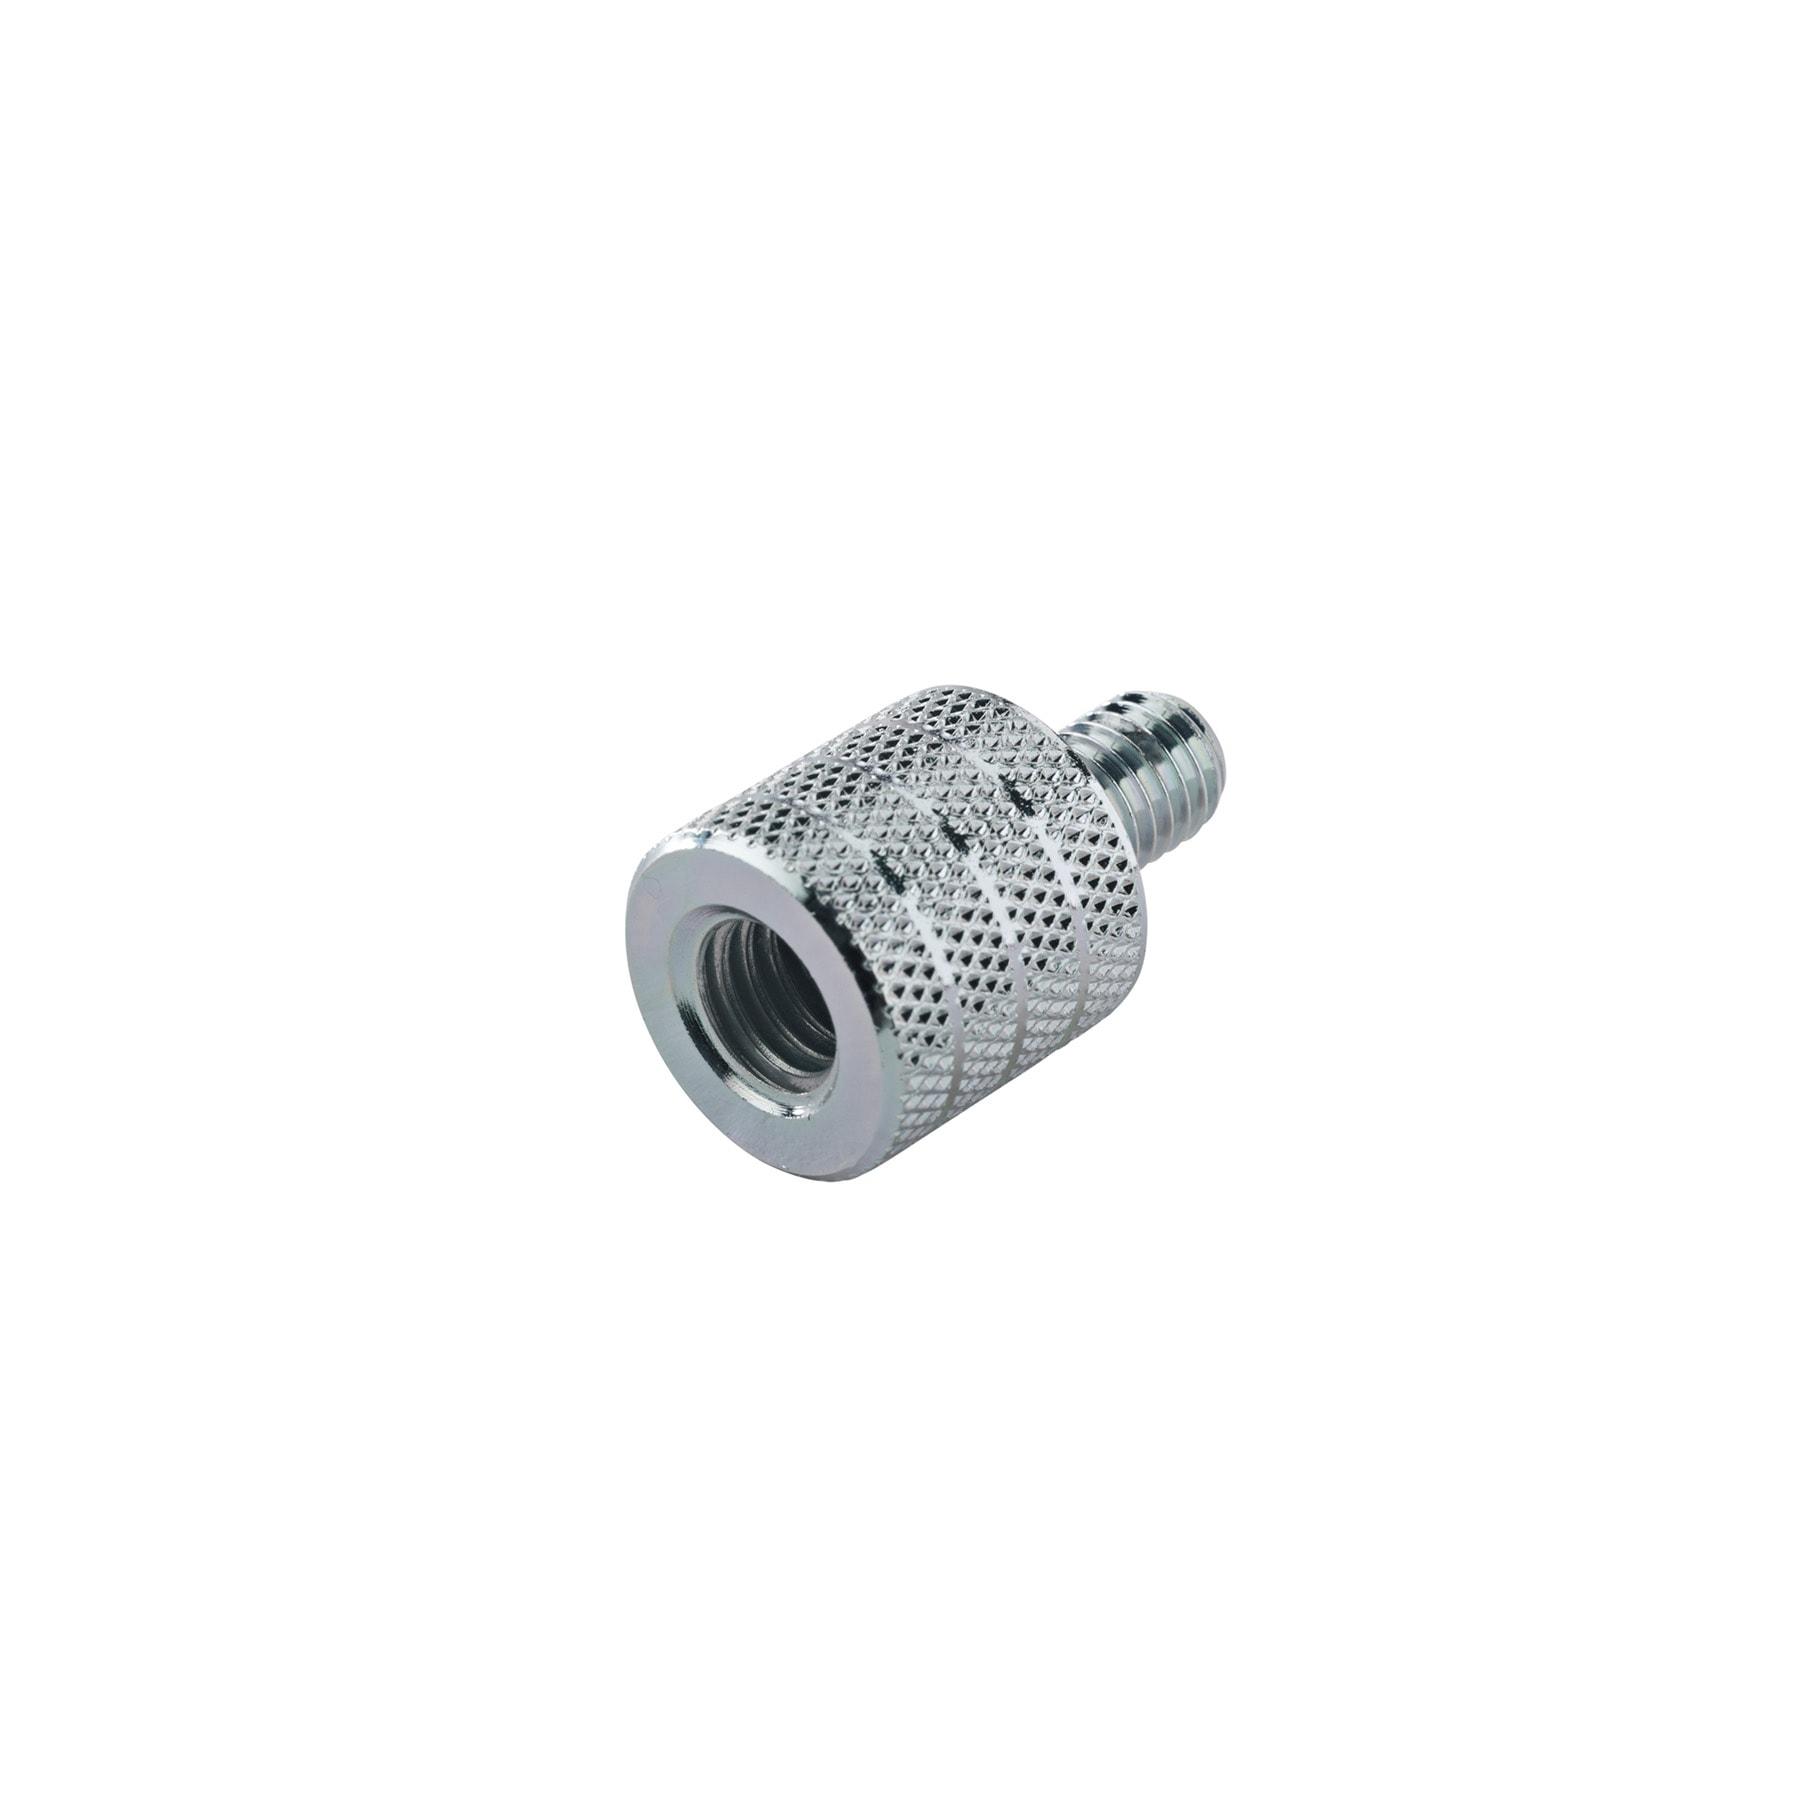 KM21918 - Thread adapter